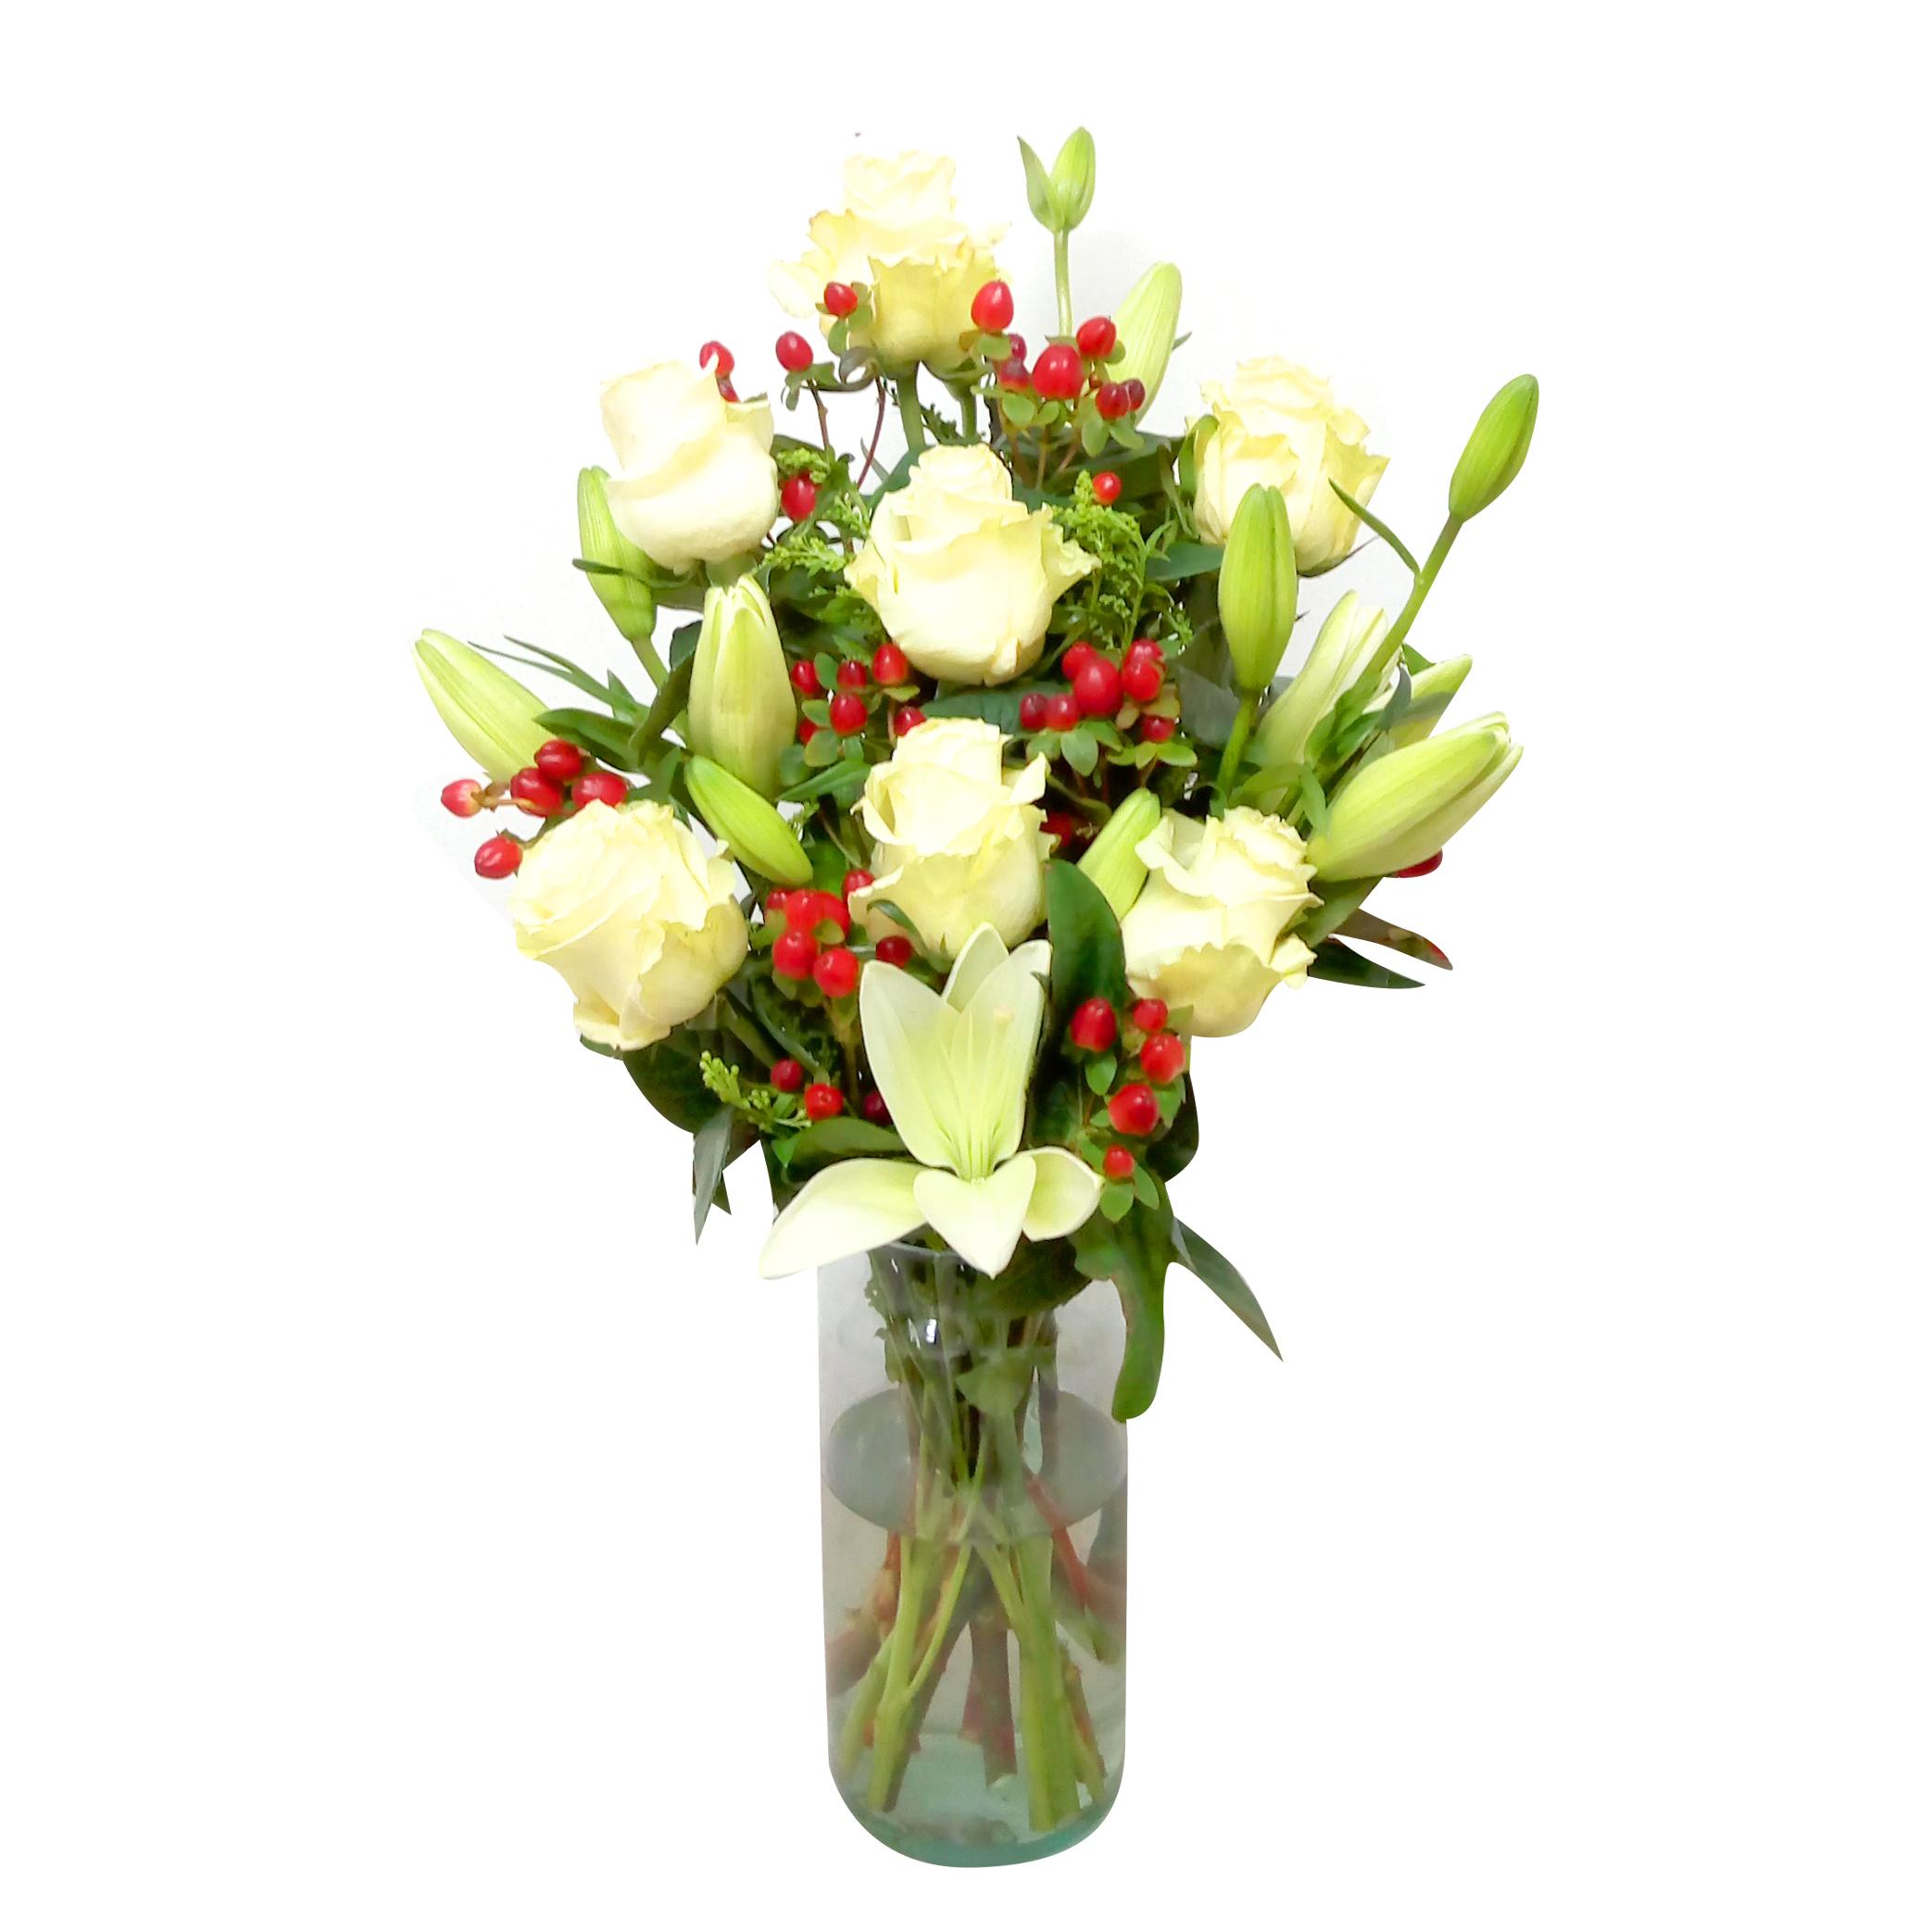 Floreros Mixto con Rosas, Lilium mas Hypericum